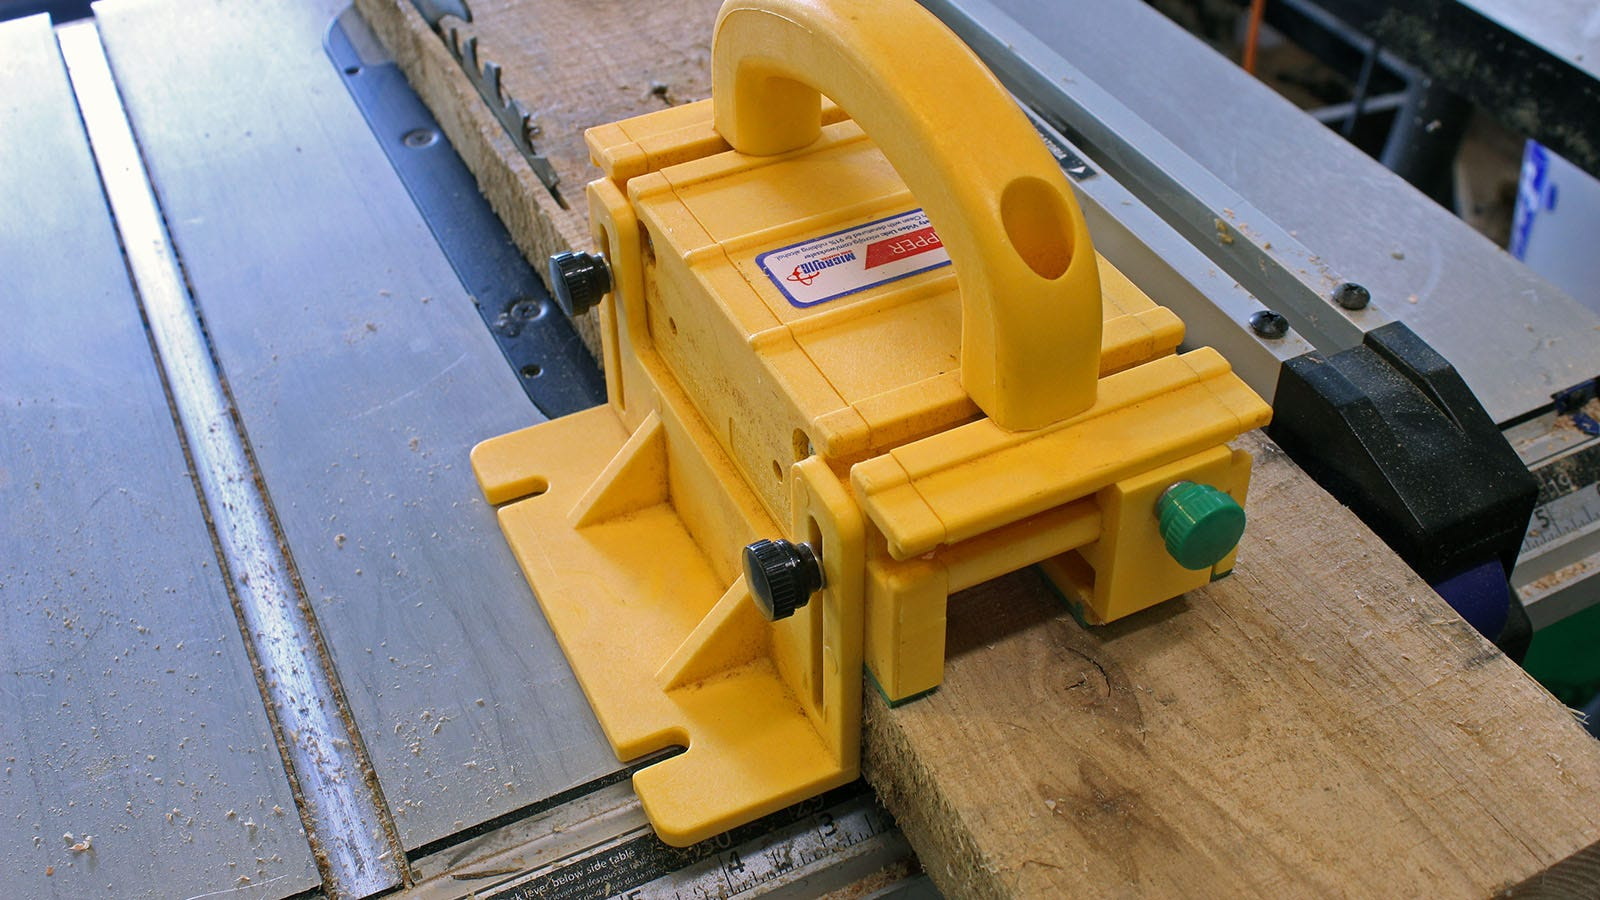 A GRR-RIPPER block pushing wood through a blade.